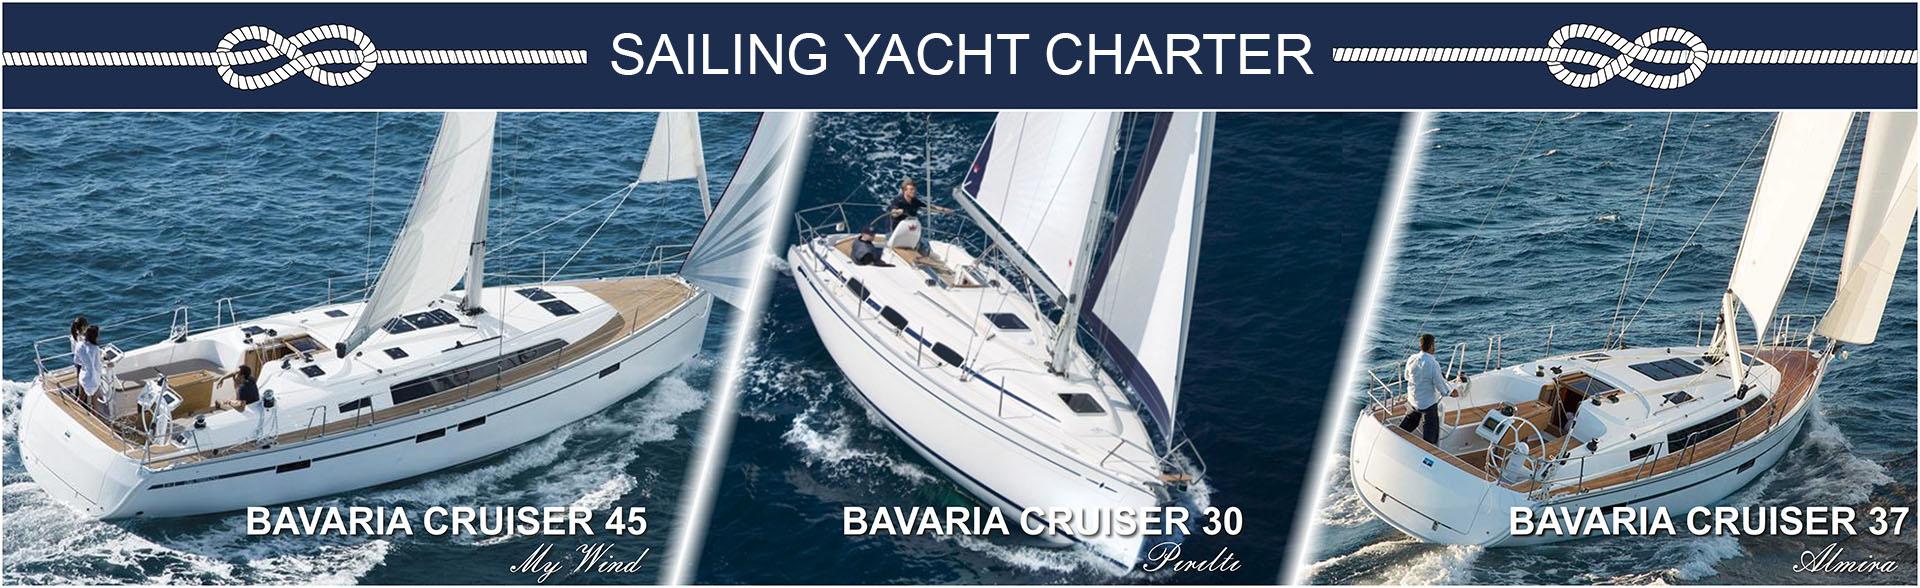 yacht charter fethiye göcek